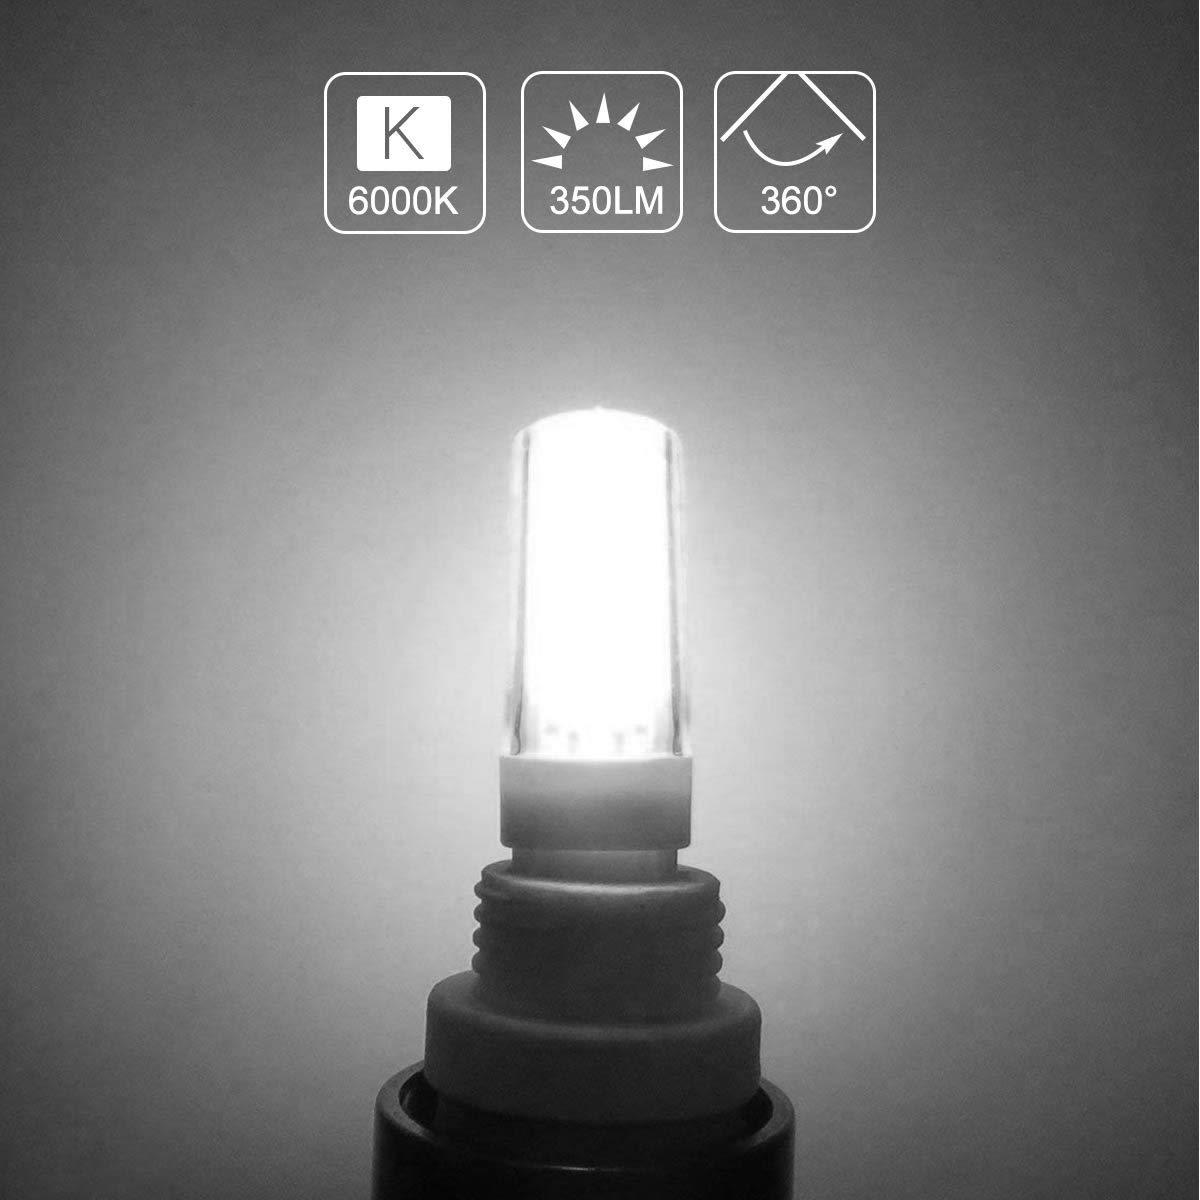 Pack of 6 G4 LED Light Bulbs Dimmable T4 JC Bi-Pin Base Energy Saving 4w Equivalent 40W Halogen Bulb Daylight White 6000K Energy Saving for Home Lighting,Puck Lights,Under Cabinet Lights